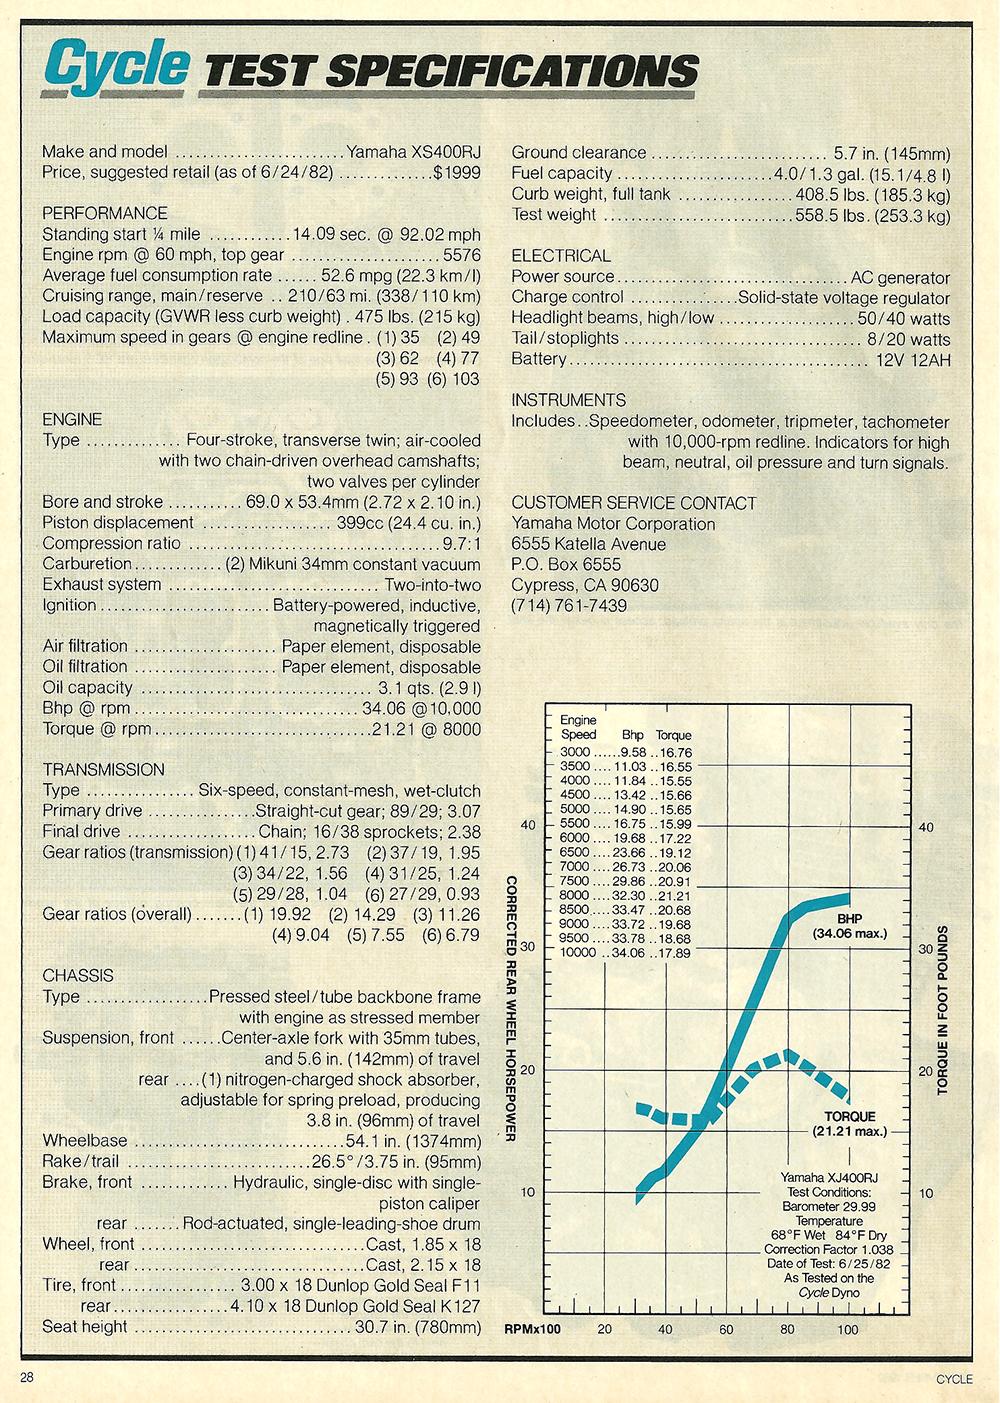 1982 Yamaha XJ400RJ Seca road test 6.jpg